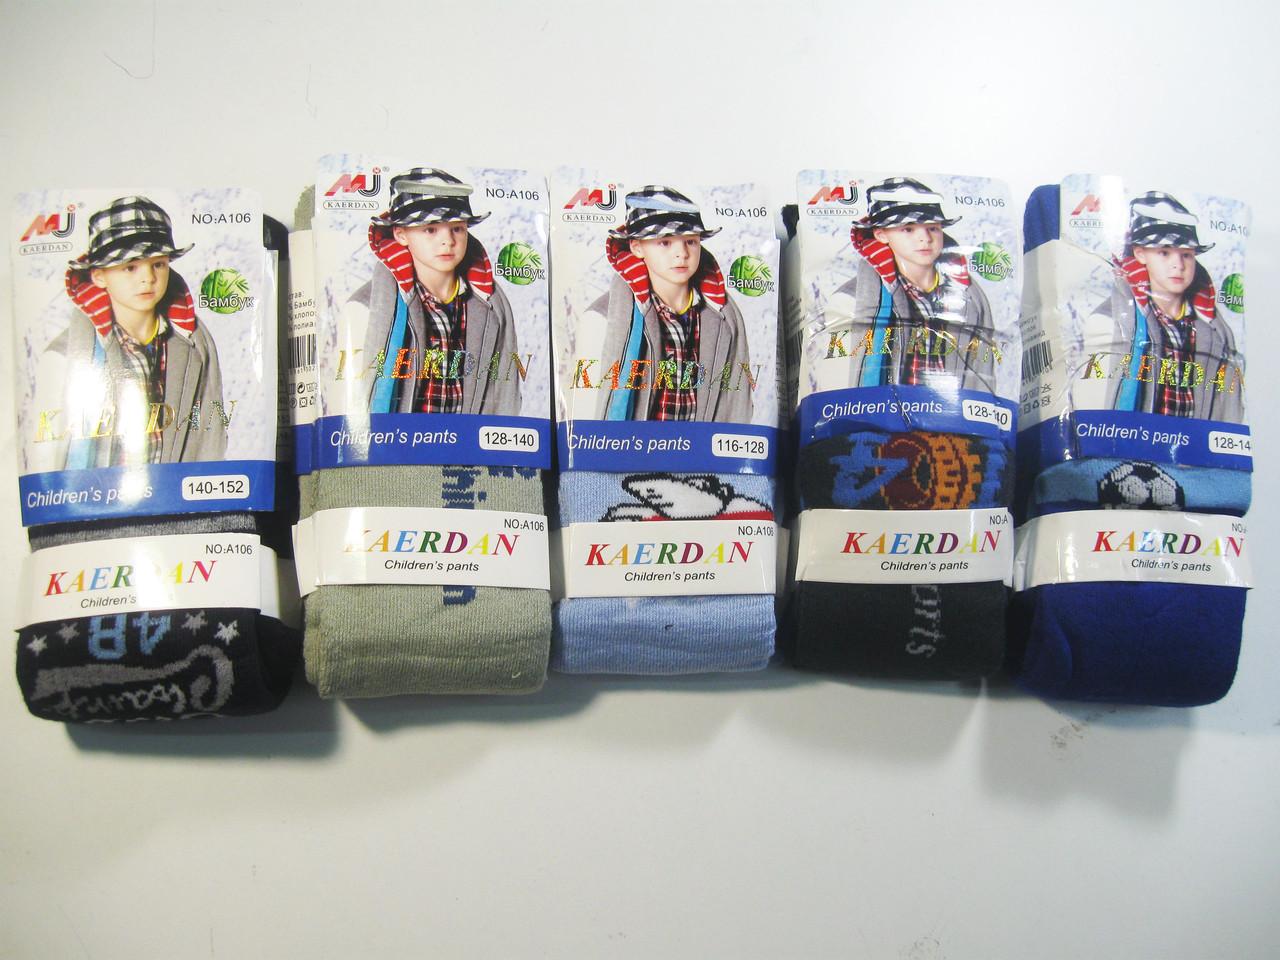 Колготы для мальчика,махровые  KAERDAN, размеры 116/122,128/140,140/152,152/164 арт. А-106.119